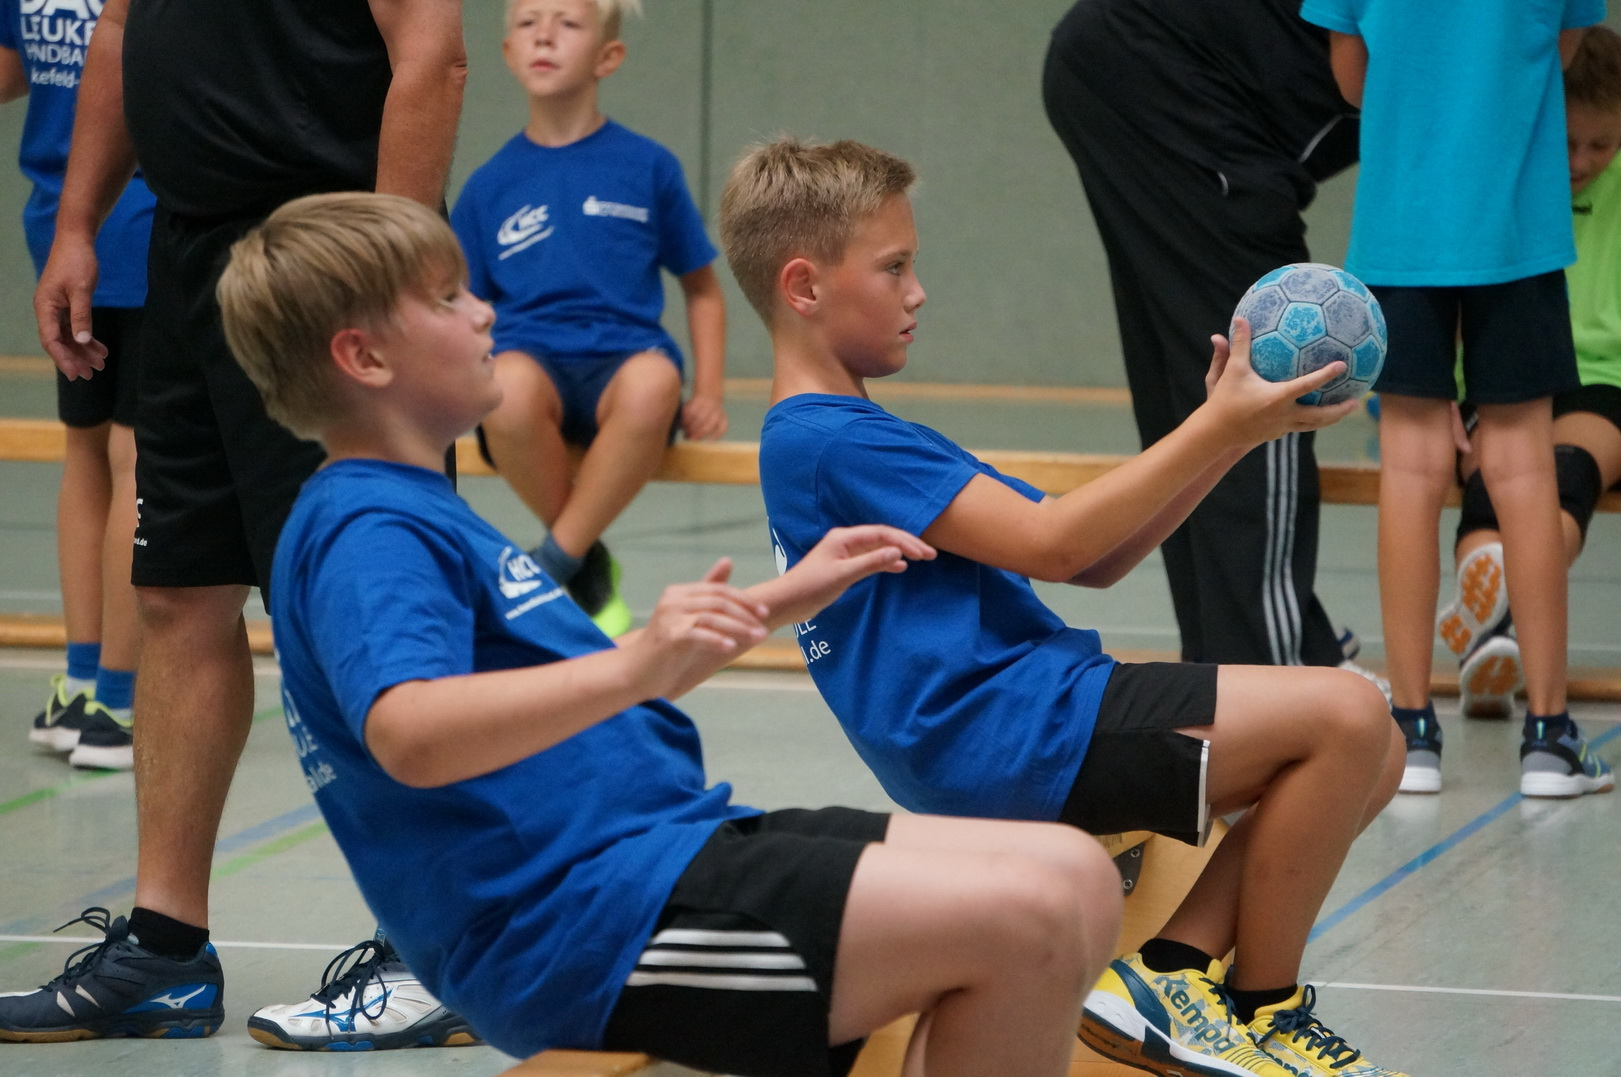 201808_Handballcamp_SDH_MG_188w